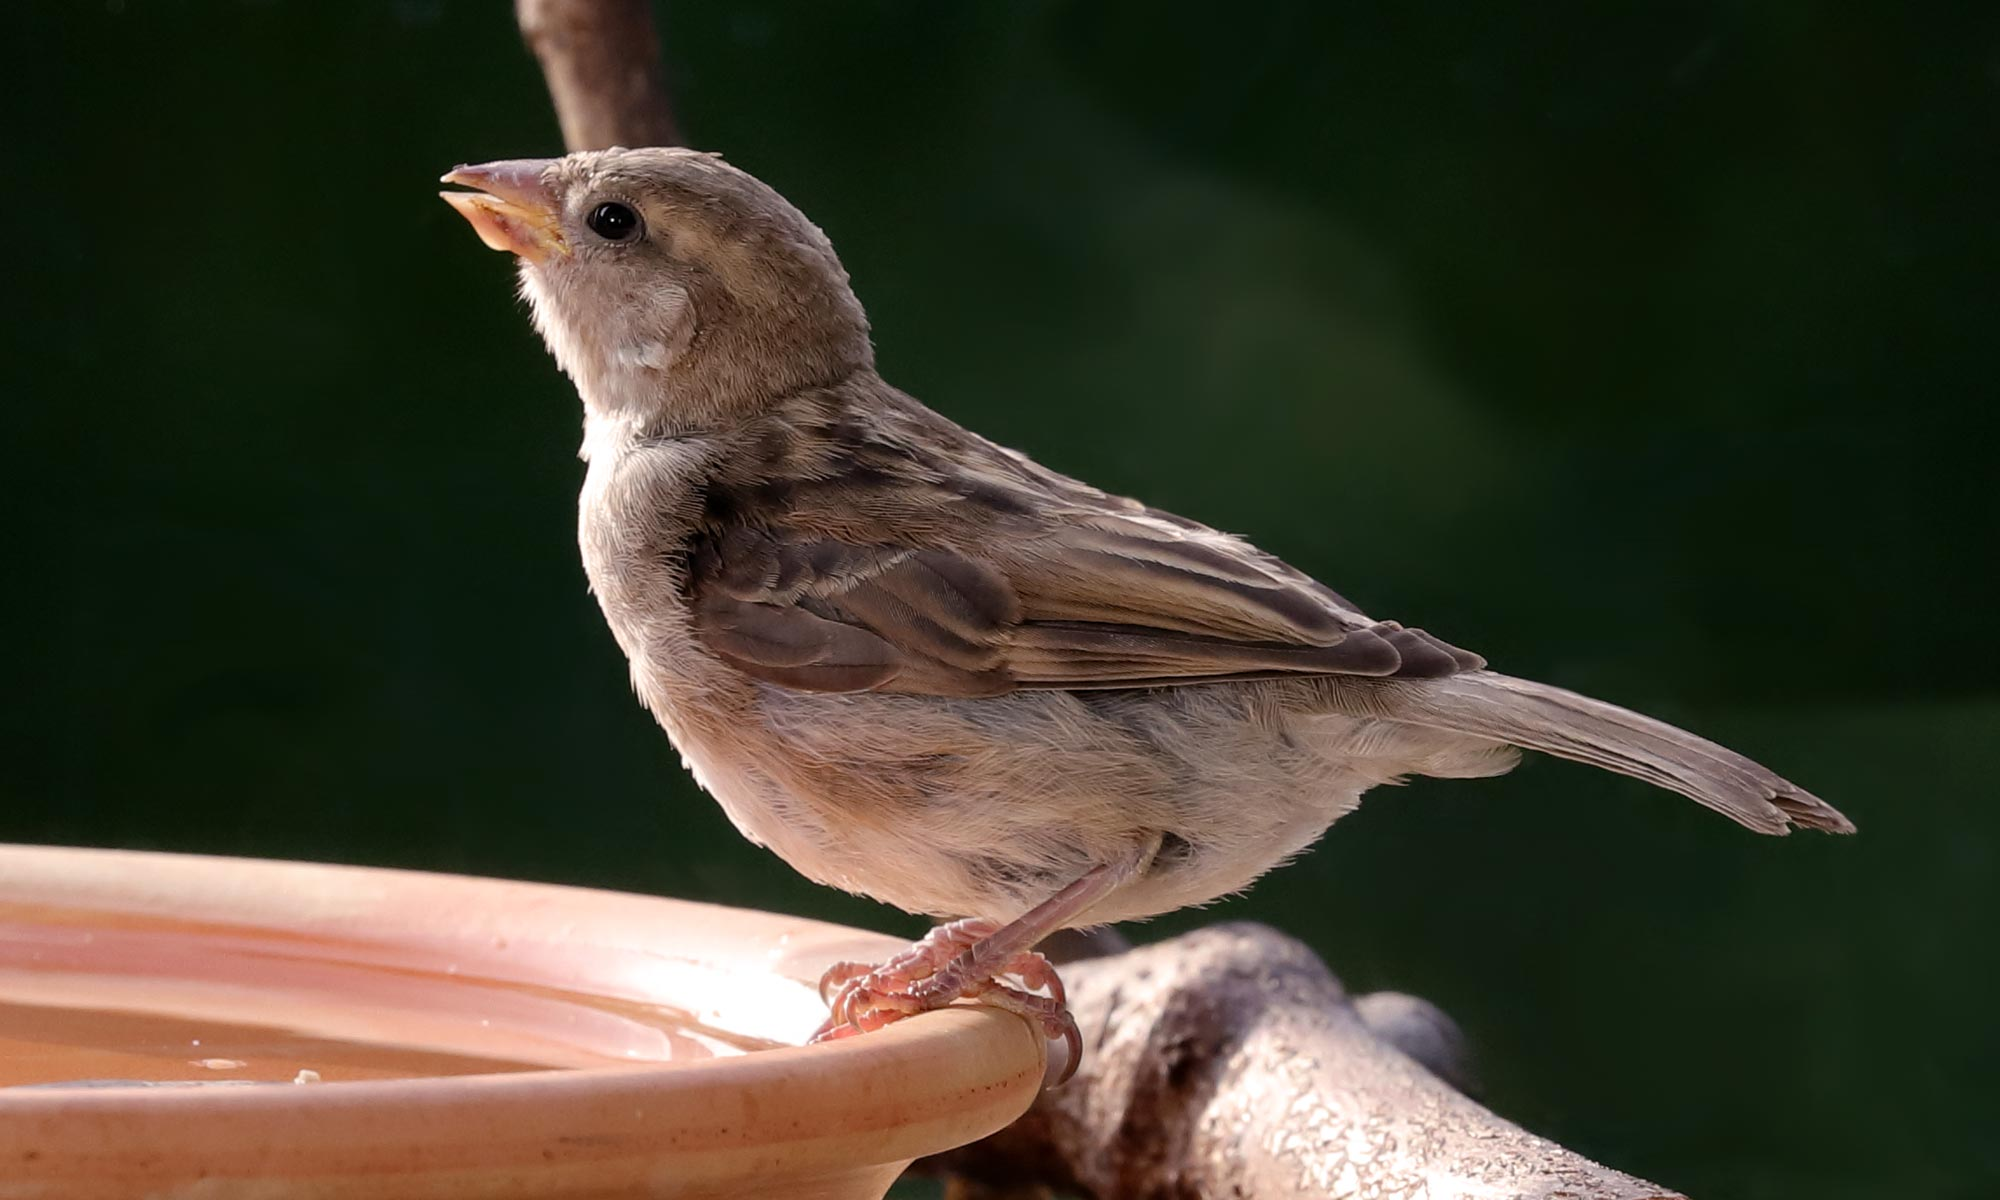 junger Haussperling (House Sparrow) beim Trinken